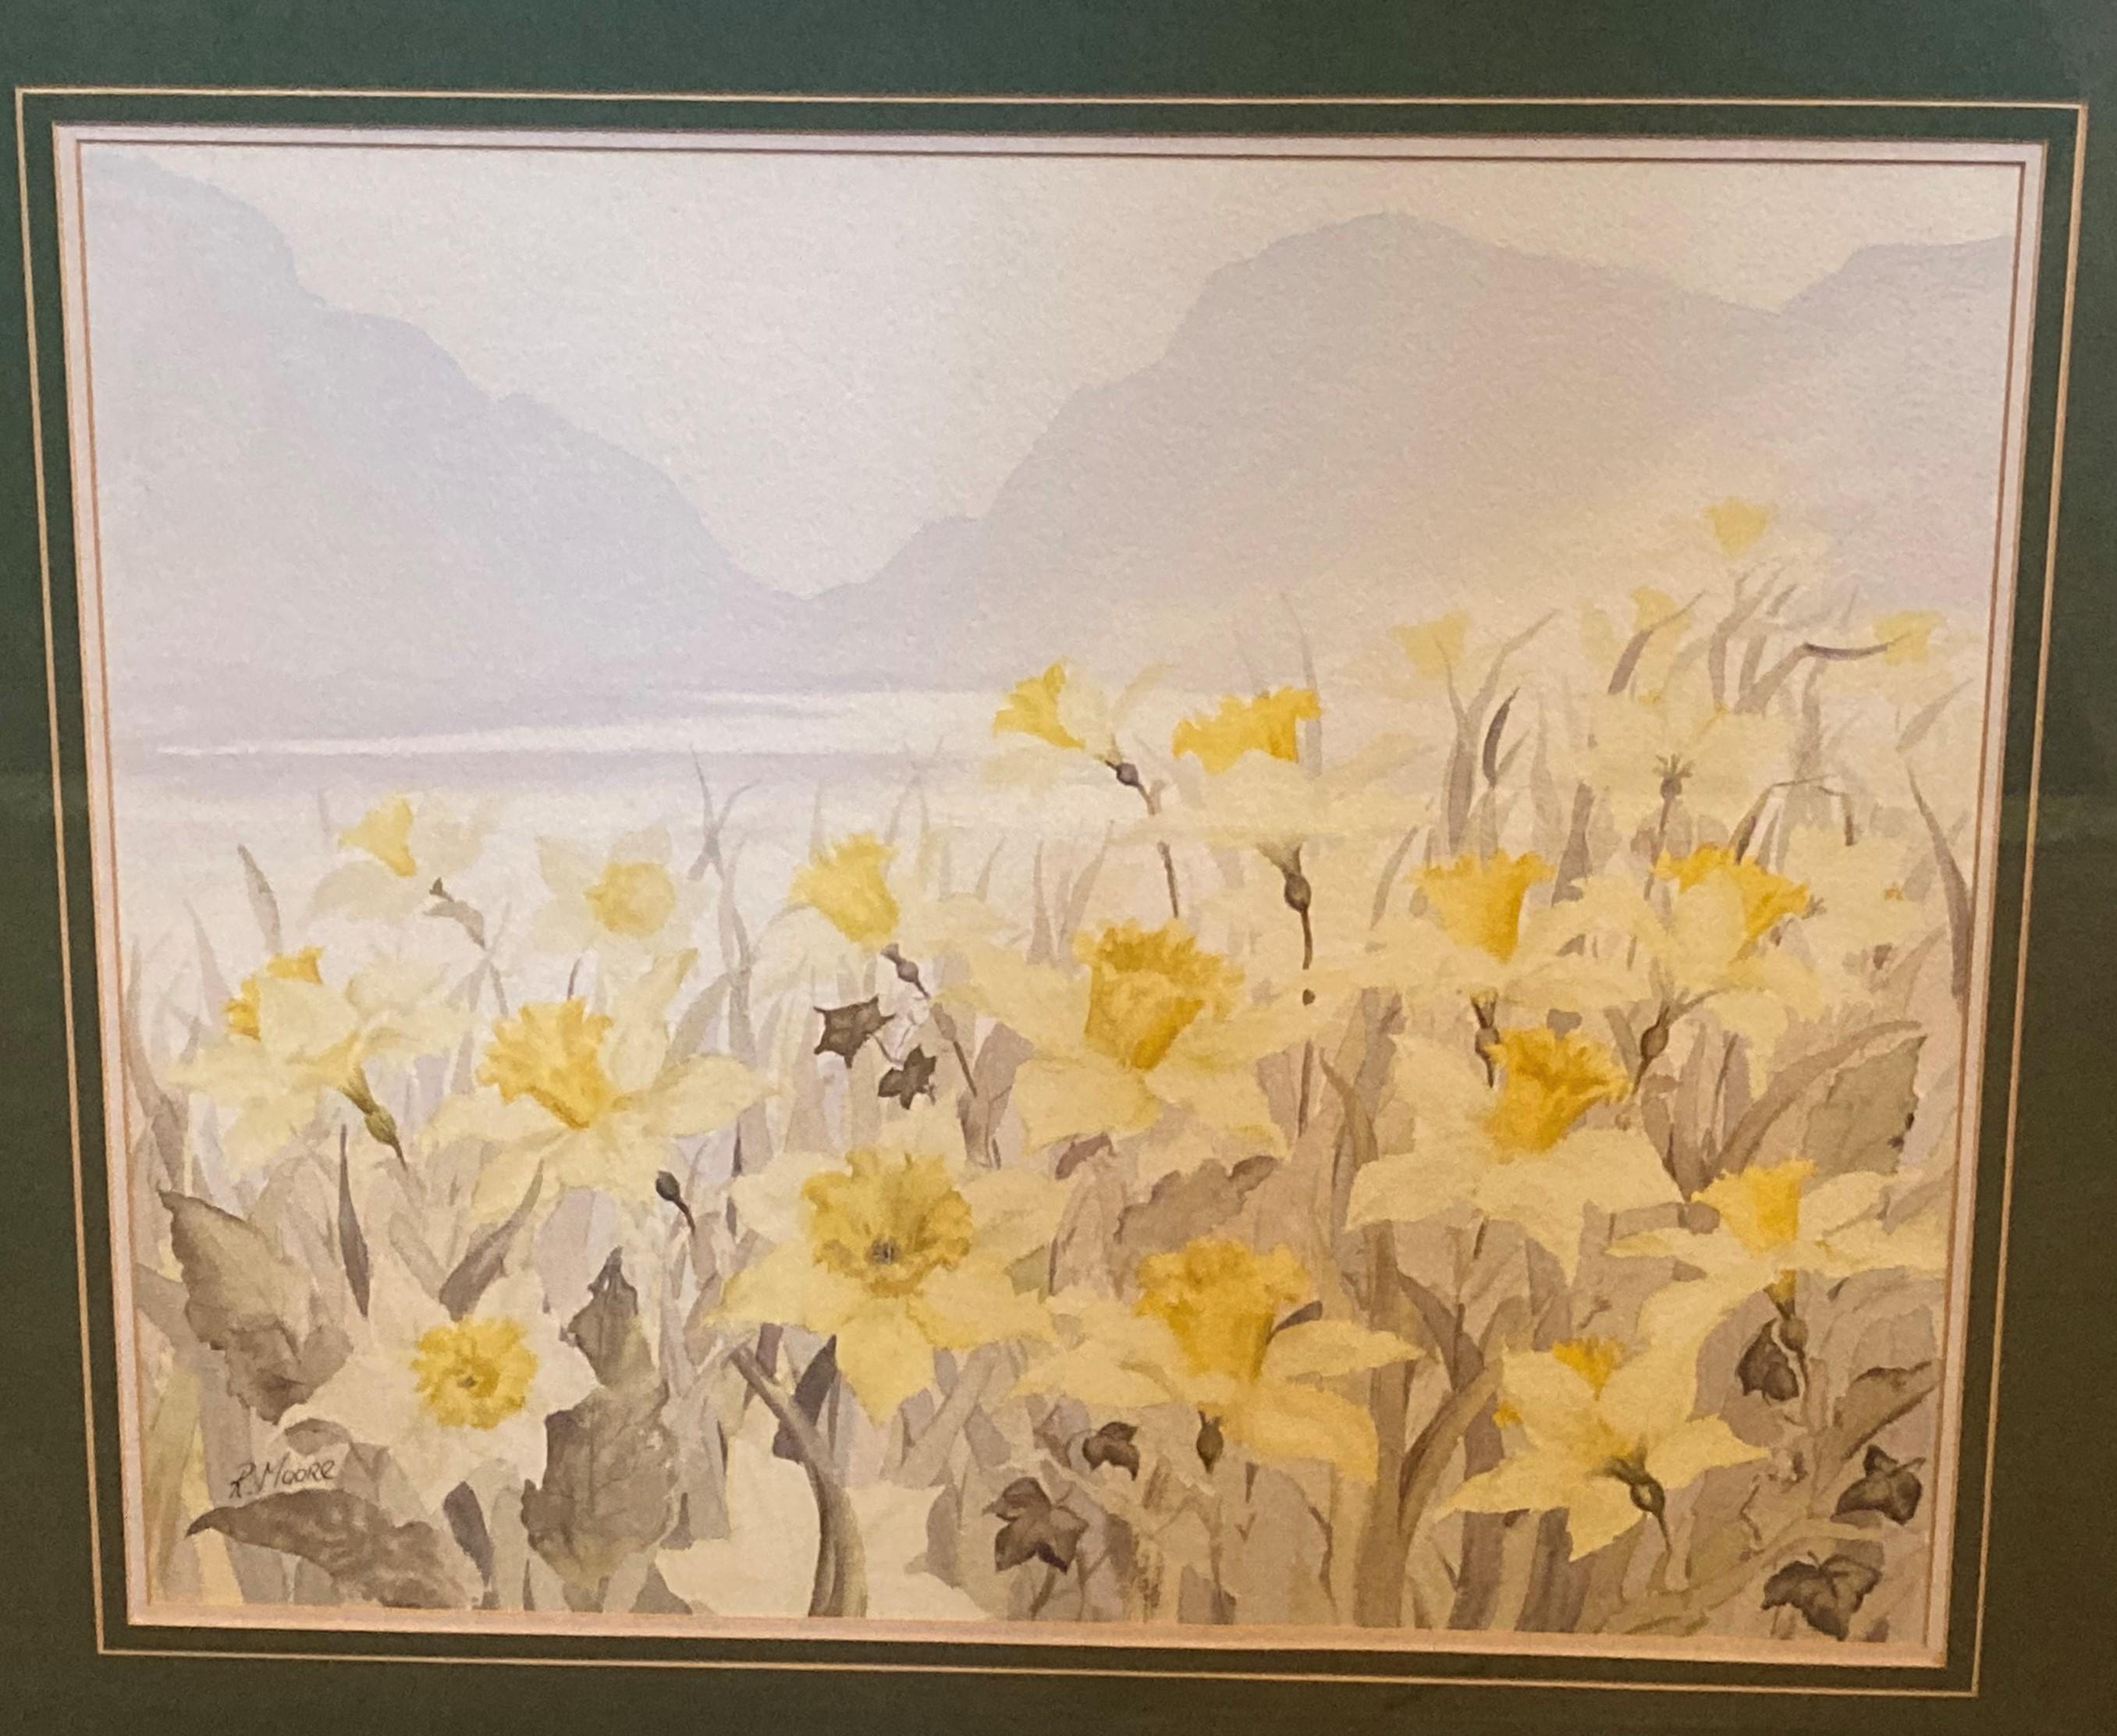 "Richard Moore, Irish School Watercolour:""Daffodils in Mountainous Landscape,"" approx. 18"" x - Image 2 of 2"